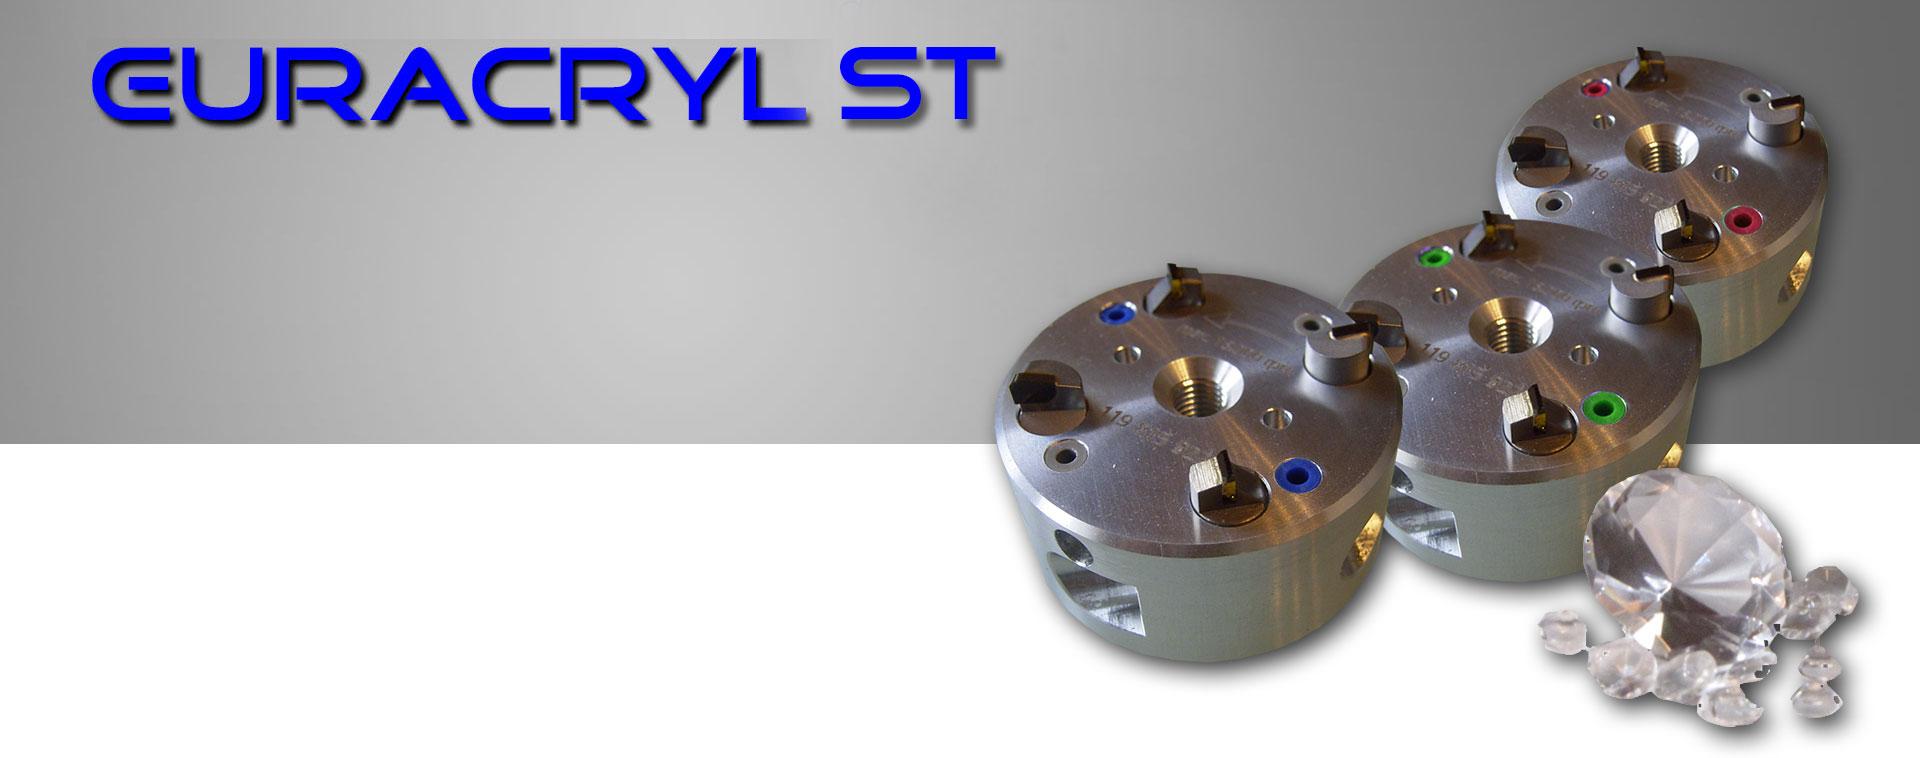 EURACRYL ST Werkzeuge für Kantenpoliermaschinen